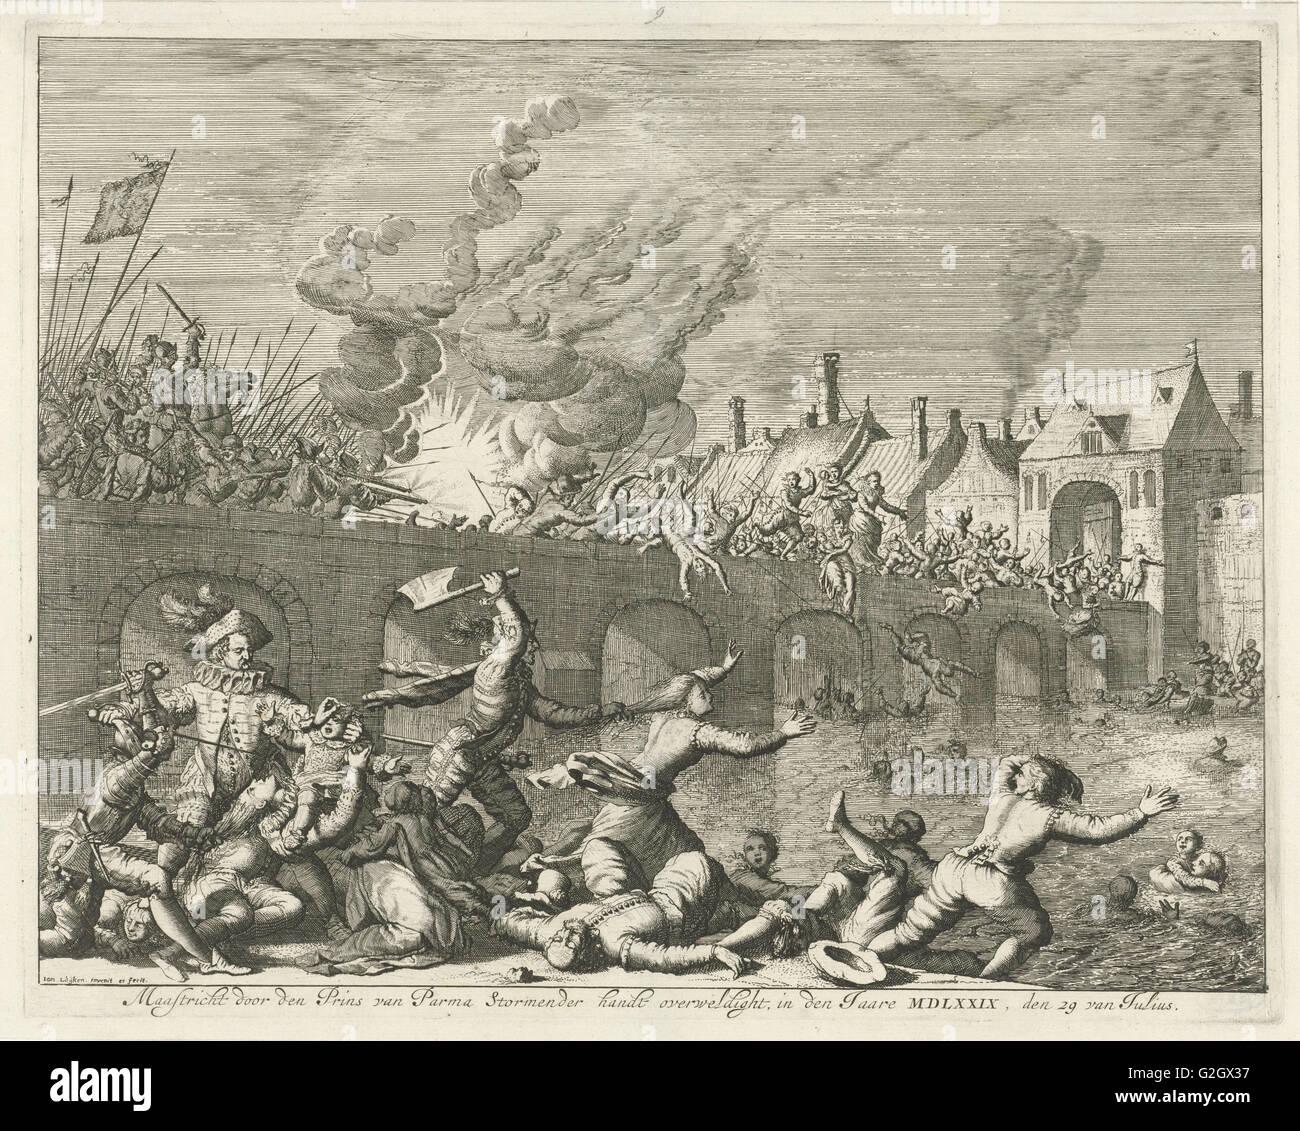 Spaniards killing people in Maastricht, 1579, Jan Luyken, 1678 - 1680 - Stock Image